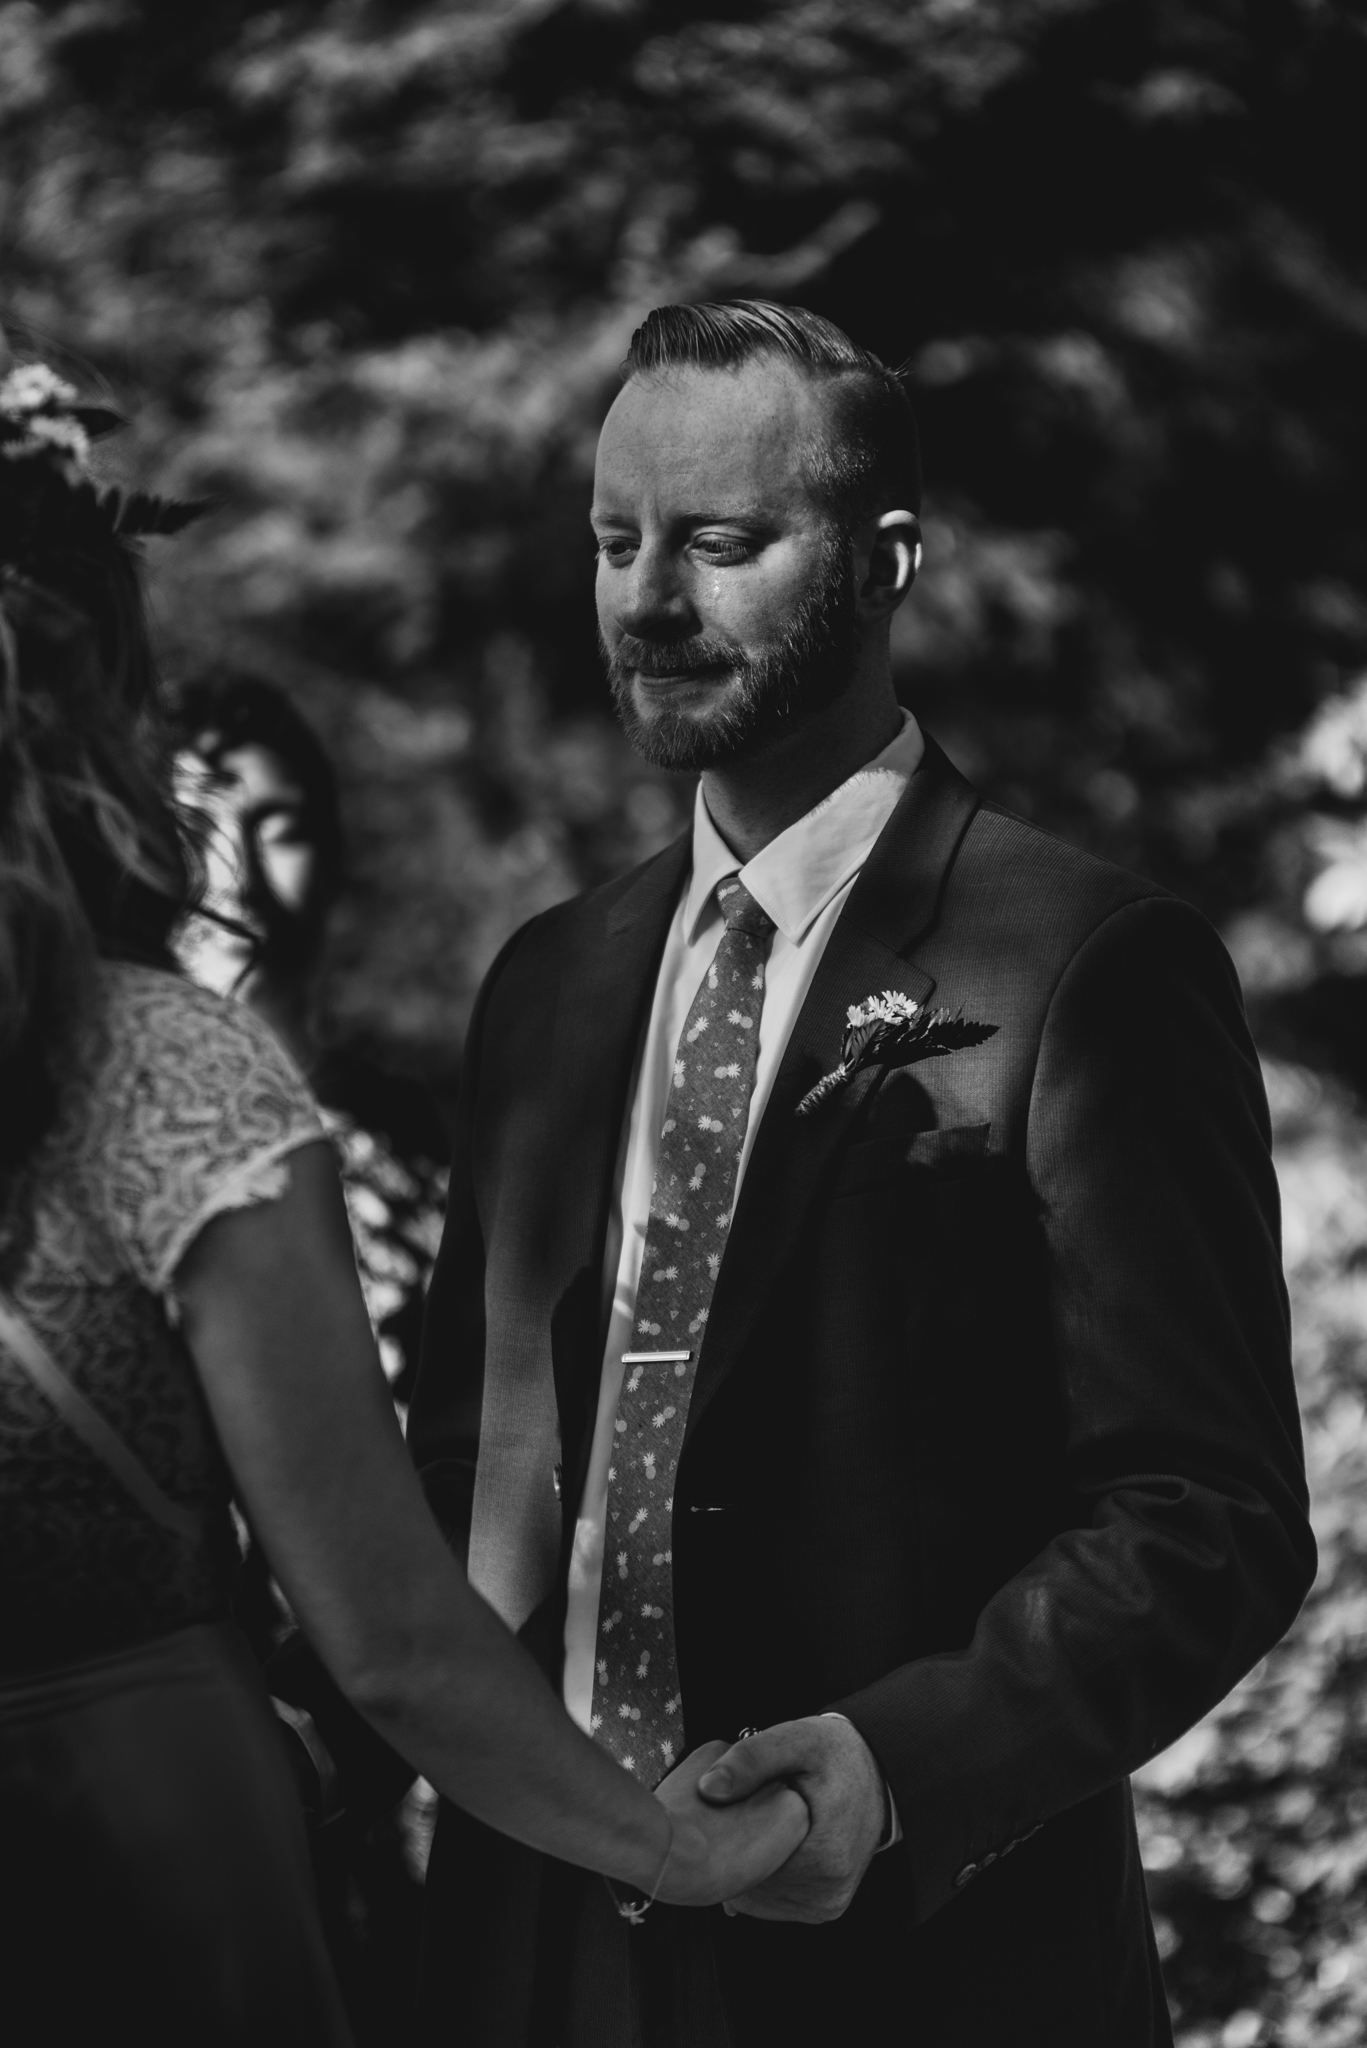 Summer Camp Wedding Photography June 2017 Massachusetts Berkshires Outdoor Wedding Photography Novella Photography Matt and Paulette Griswold (94).jpg